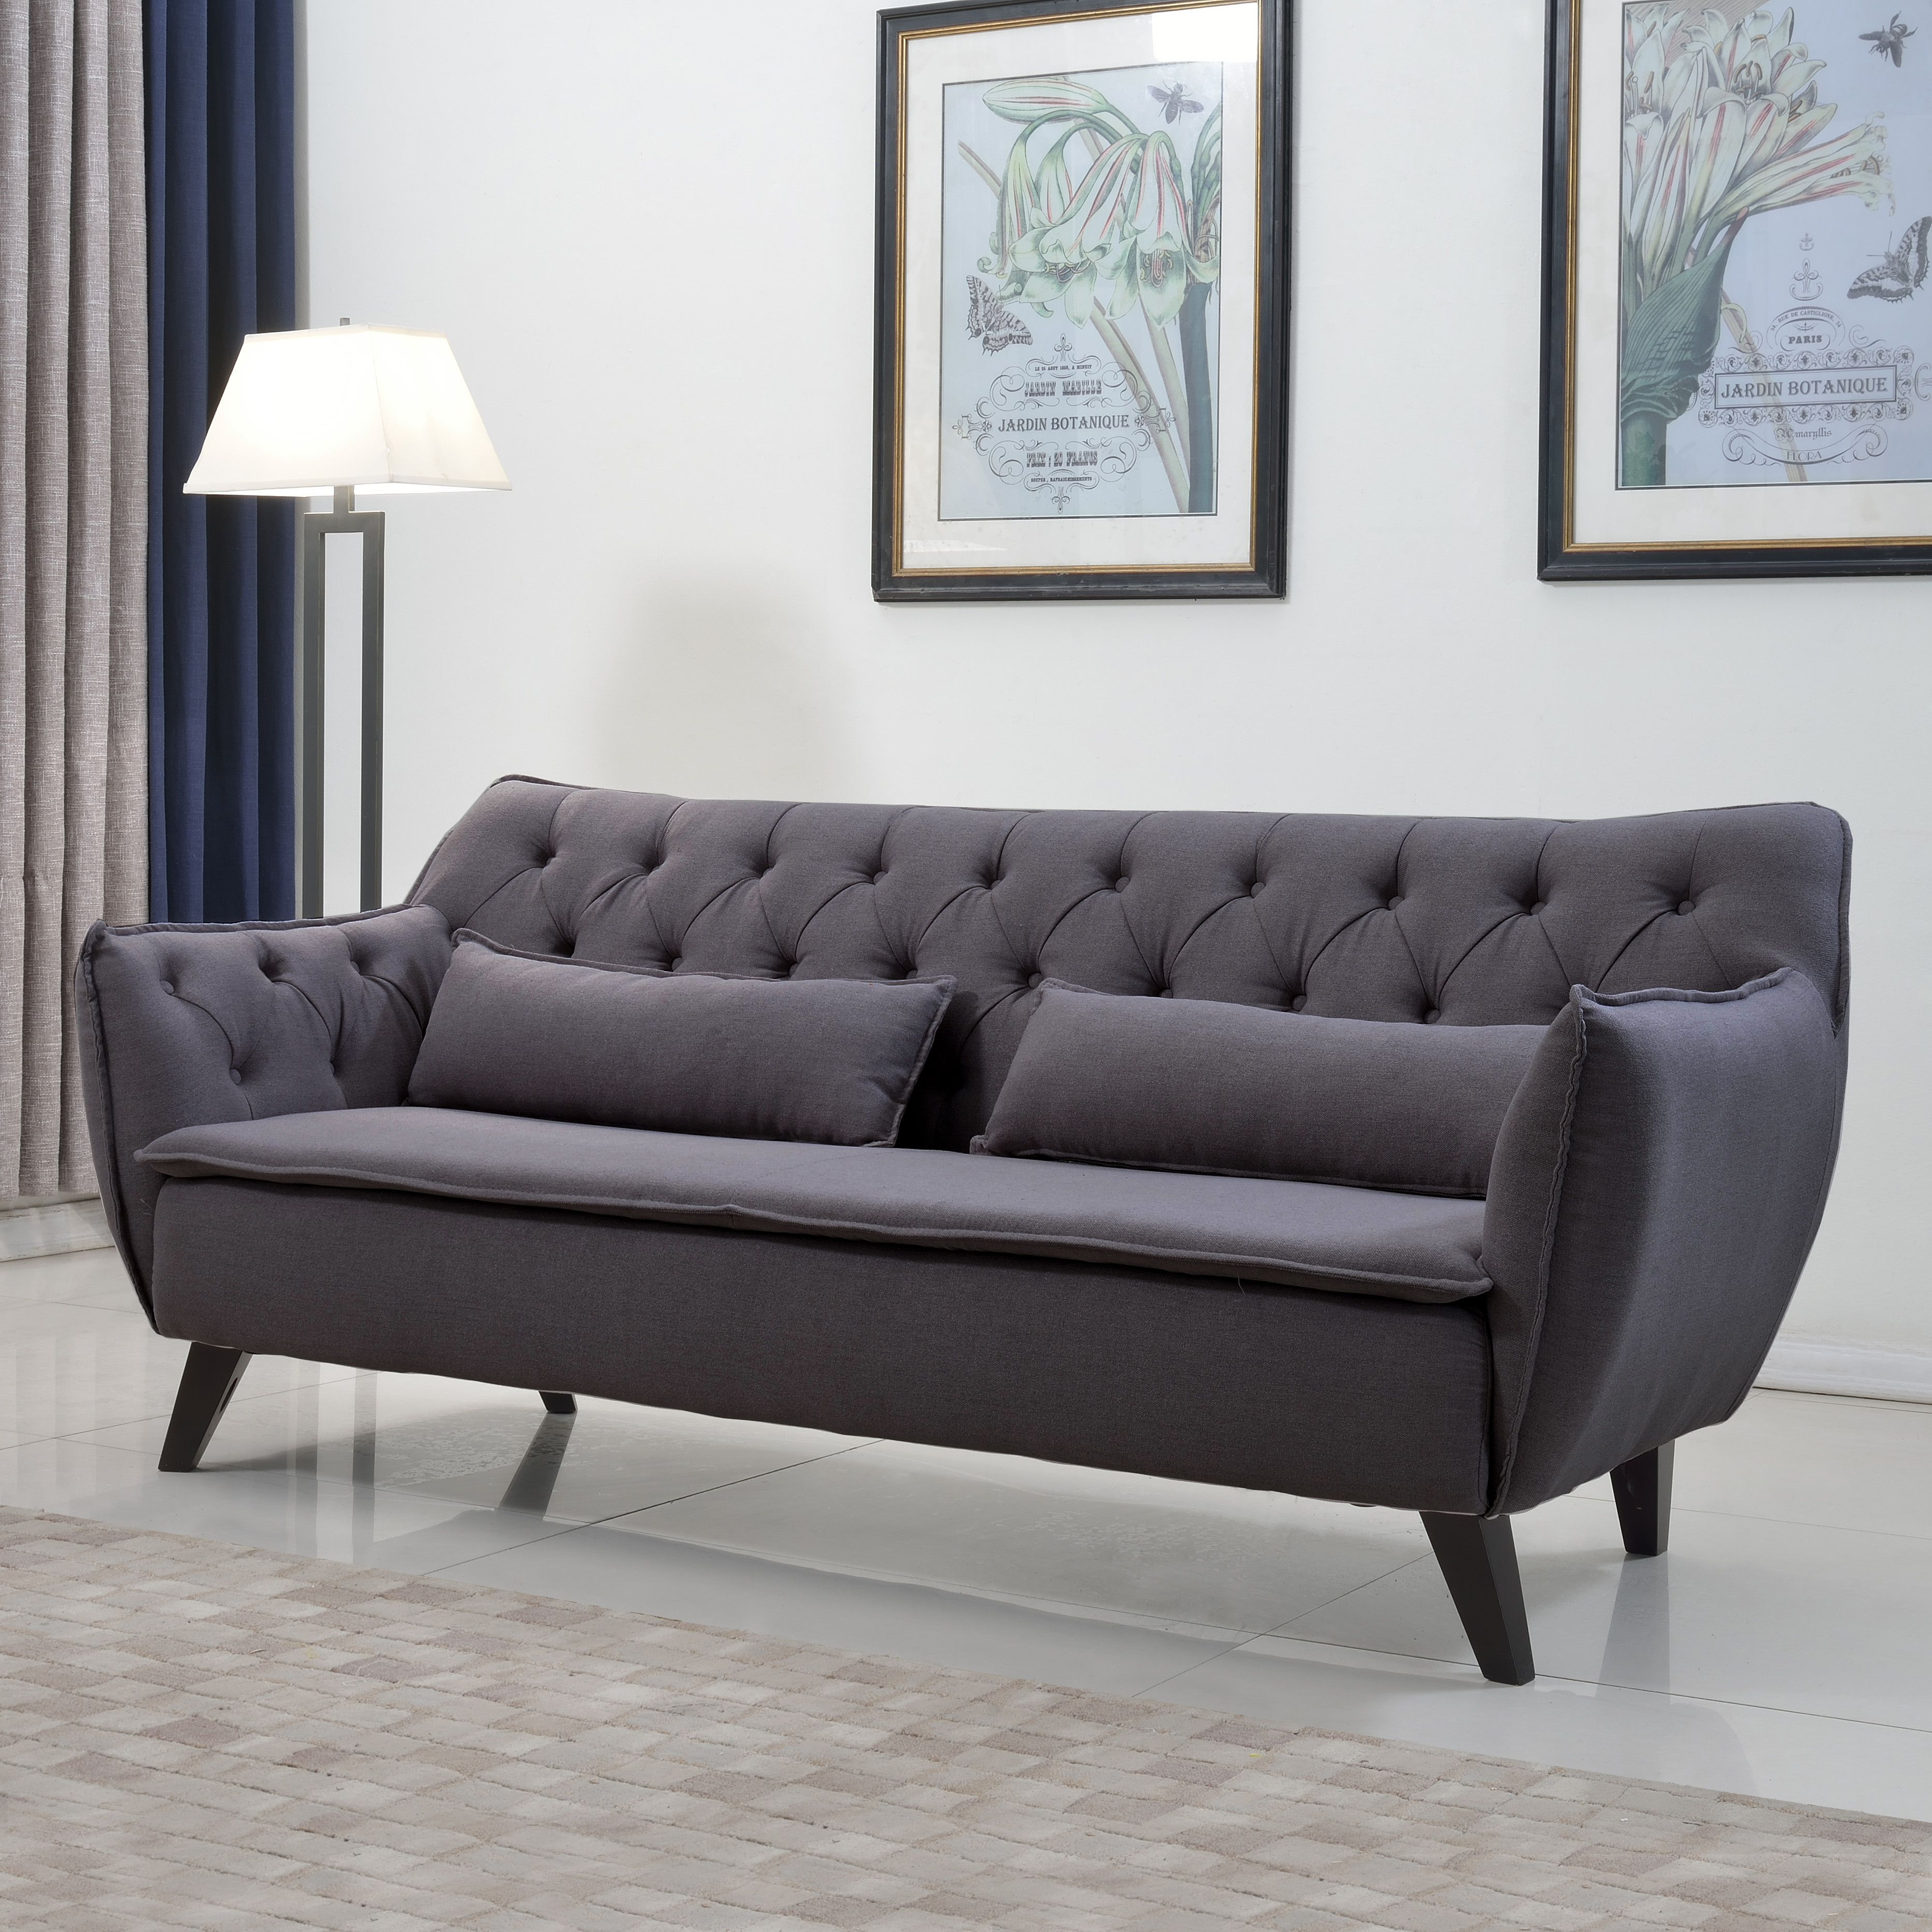 Nice Sofa Wayfair Good 29 Modern Inspiration With Http